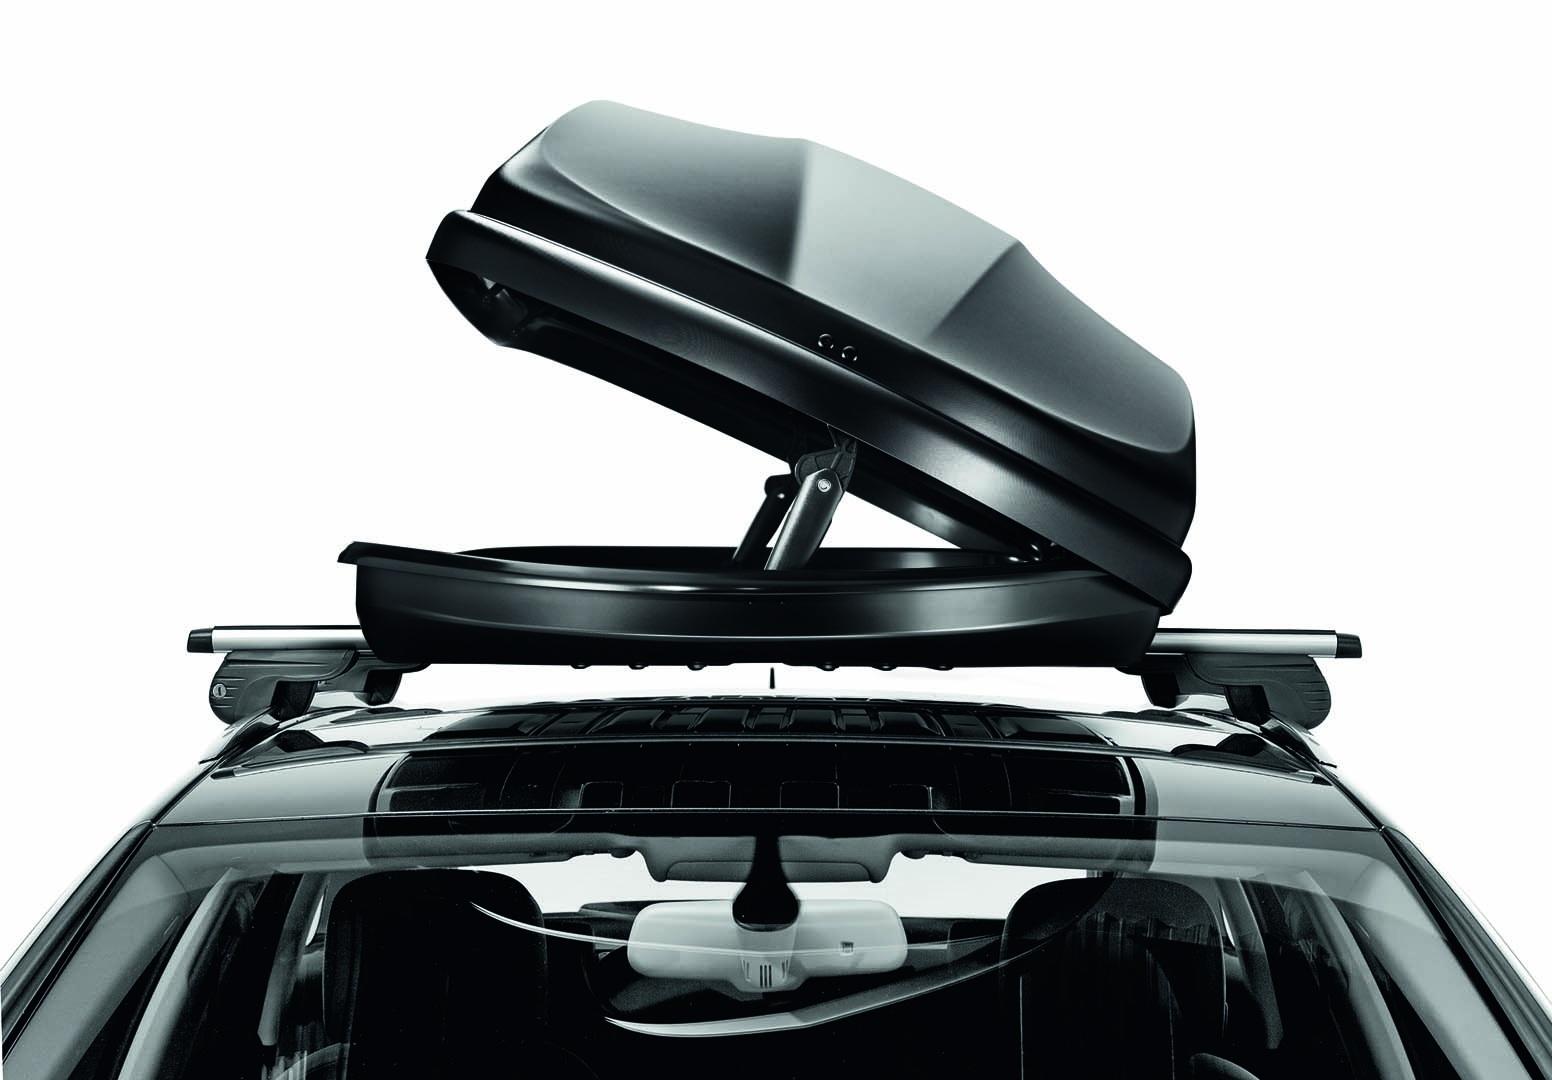 Багажник на крышу машины бокс